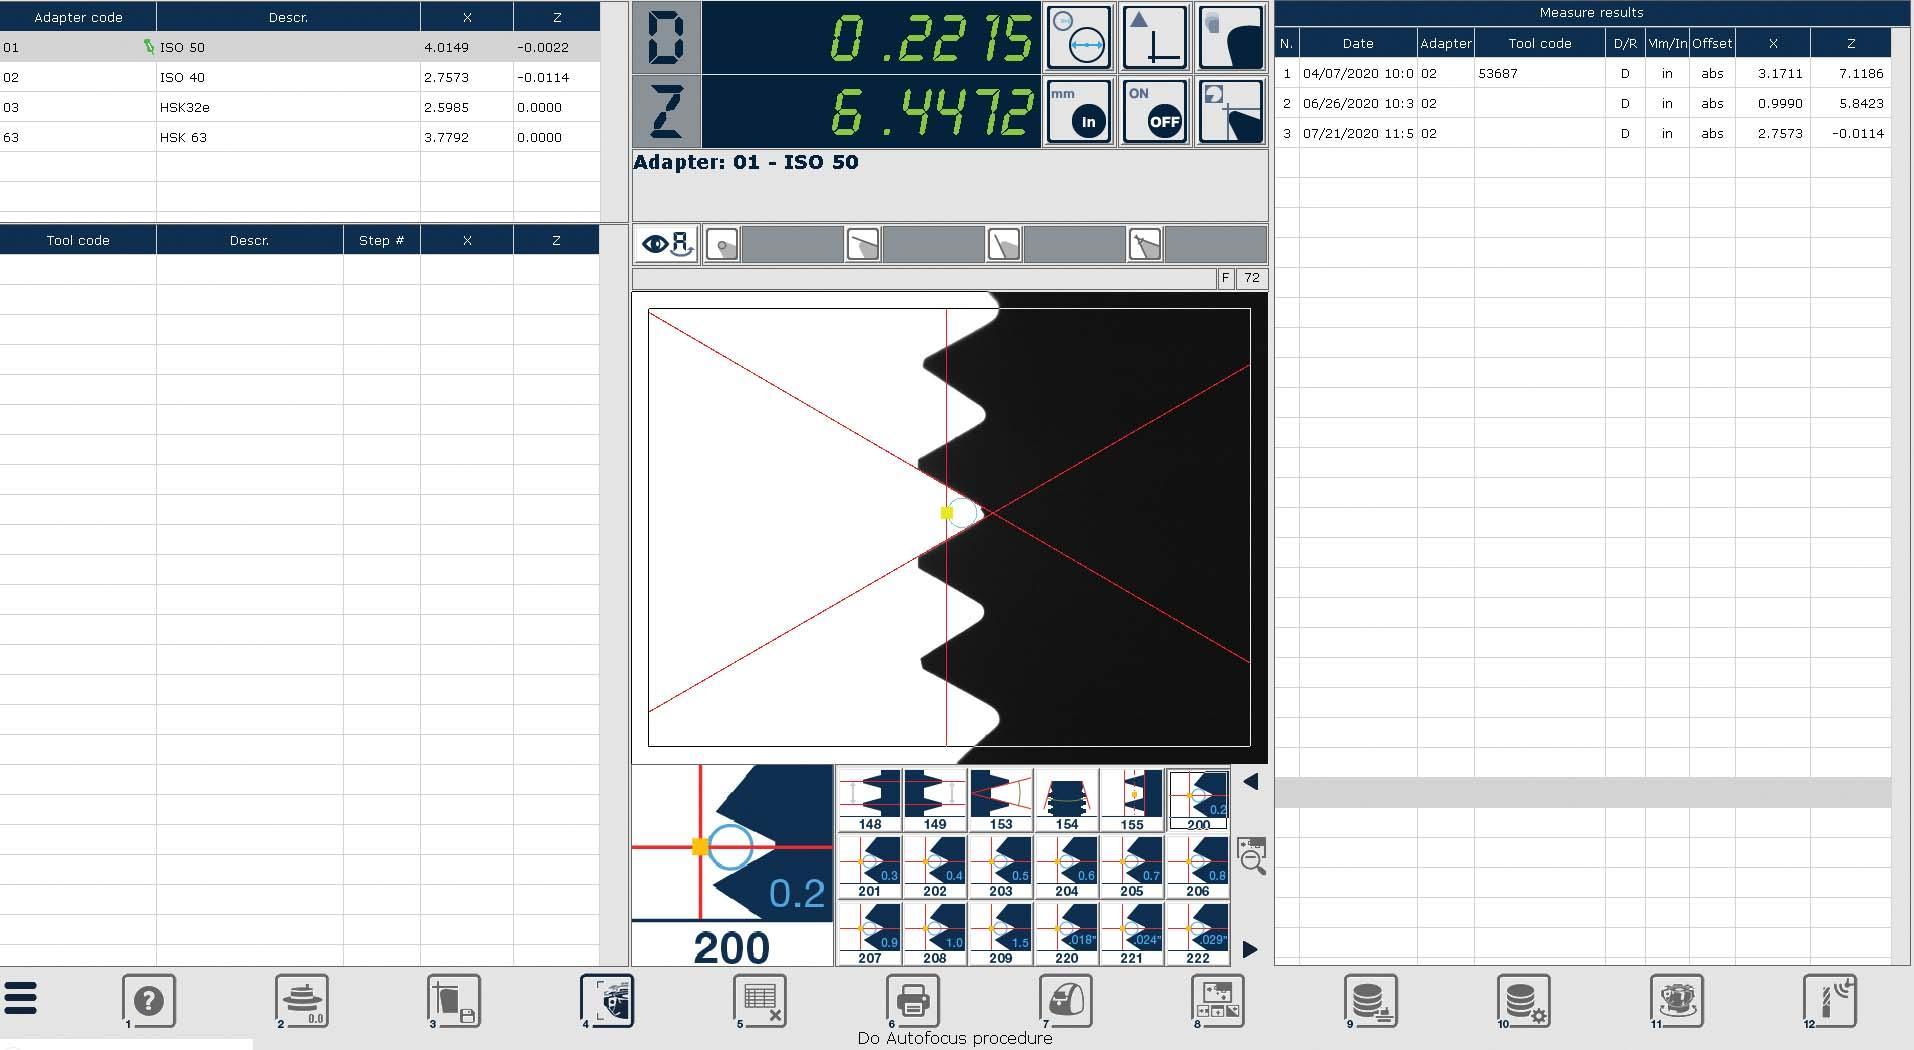 Edge Pro Control Software automatic measurement screen capture.